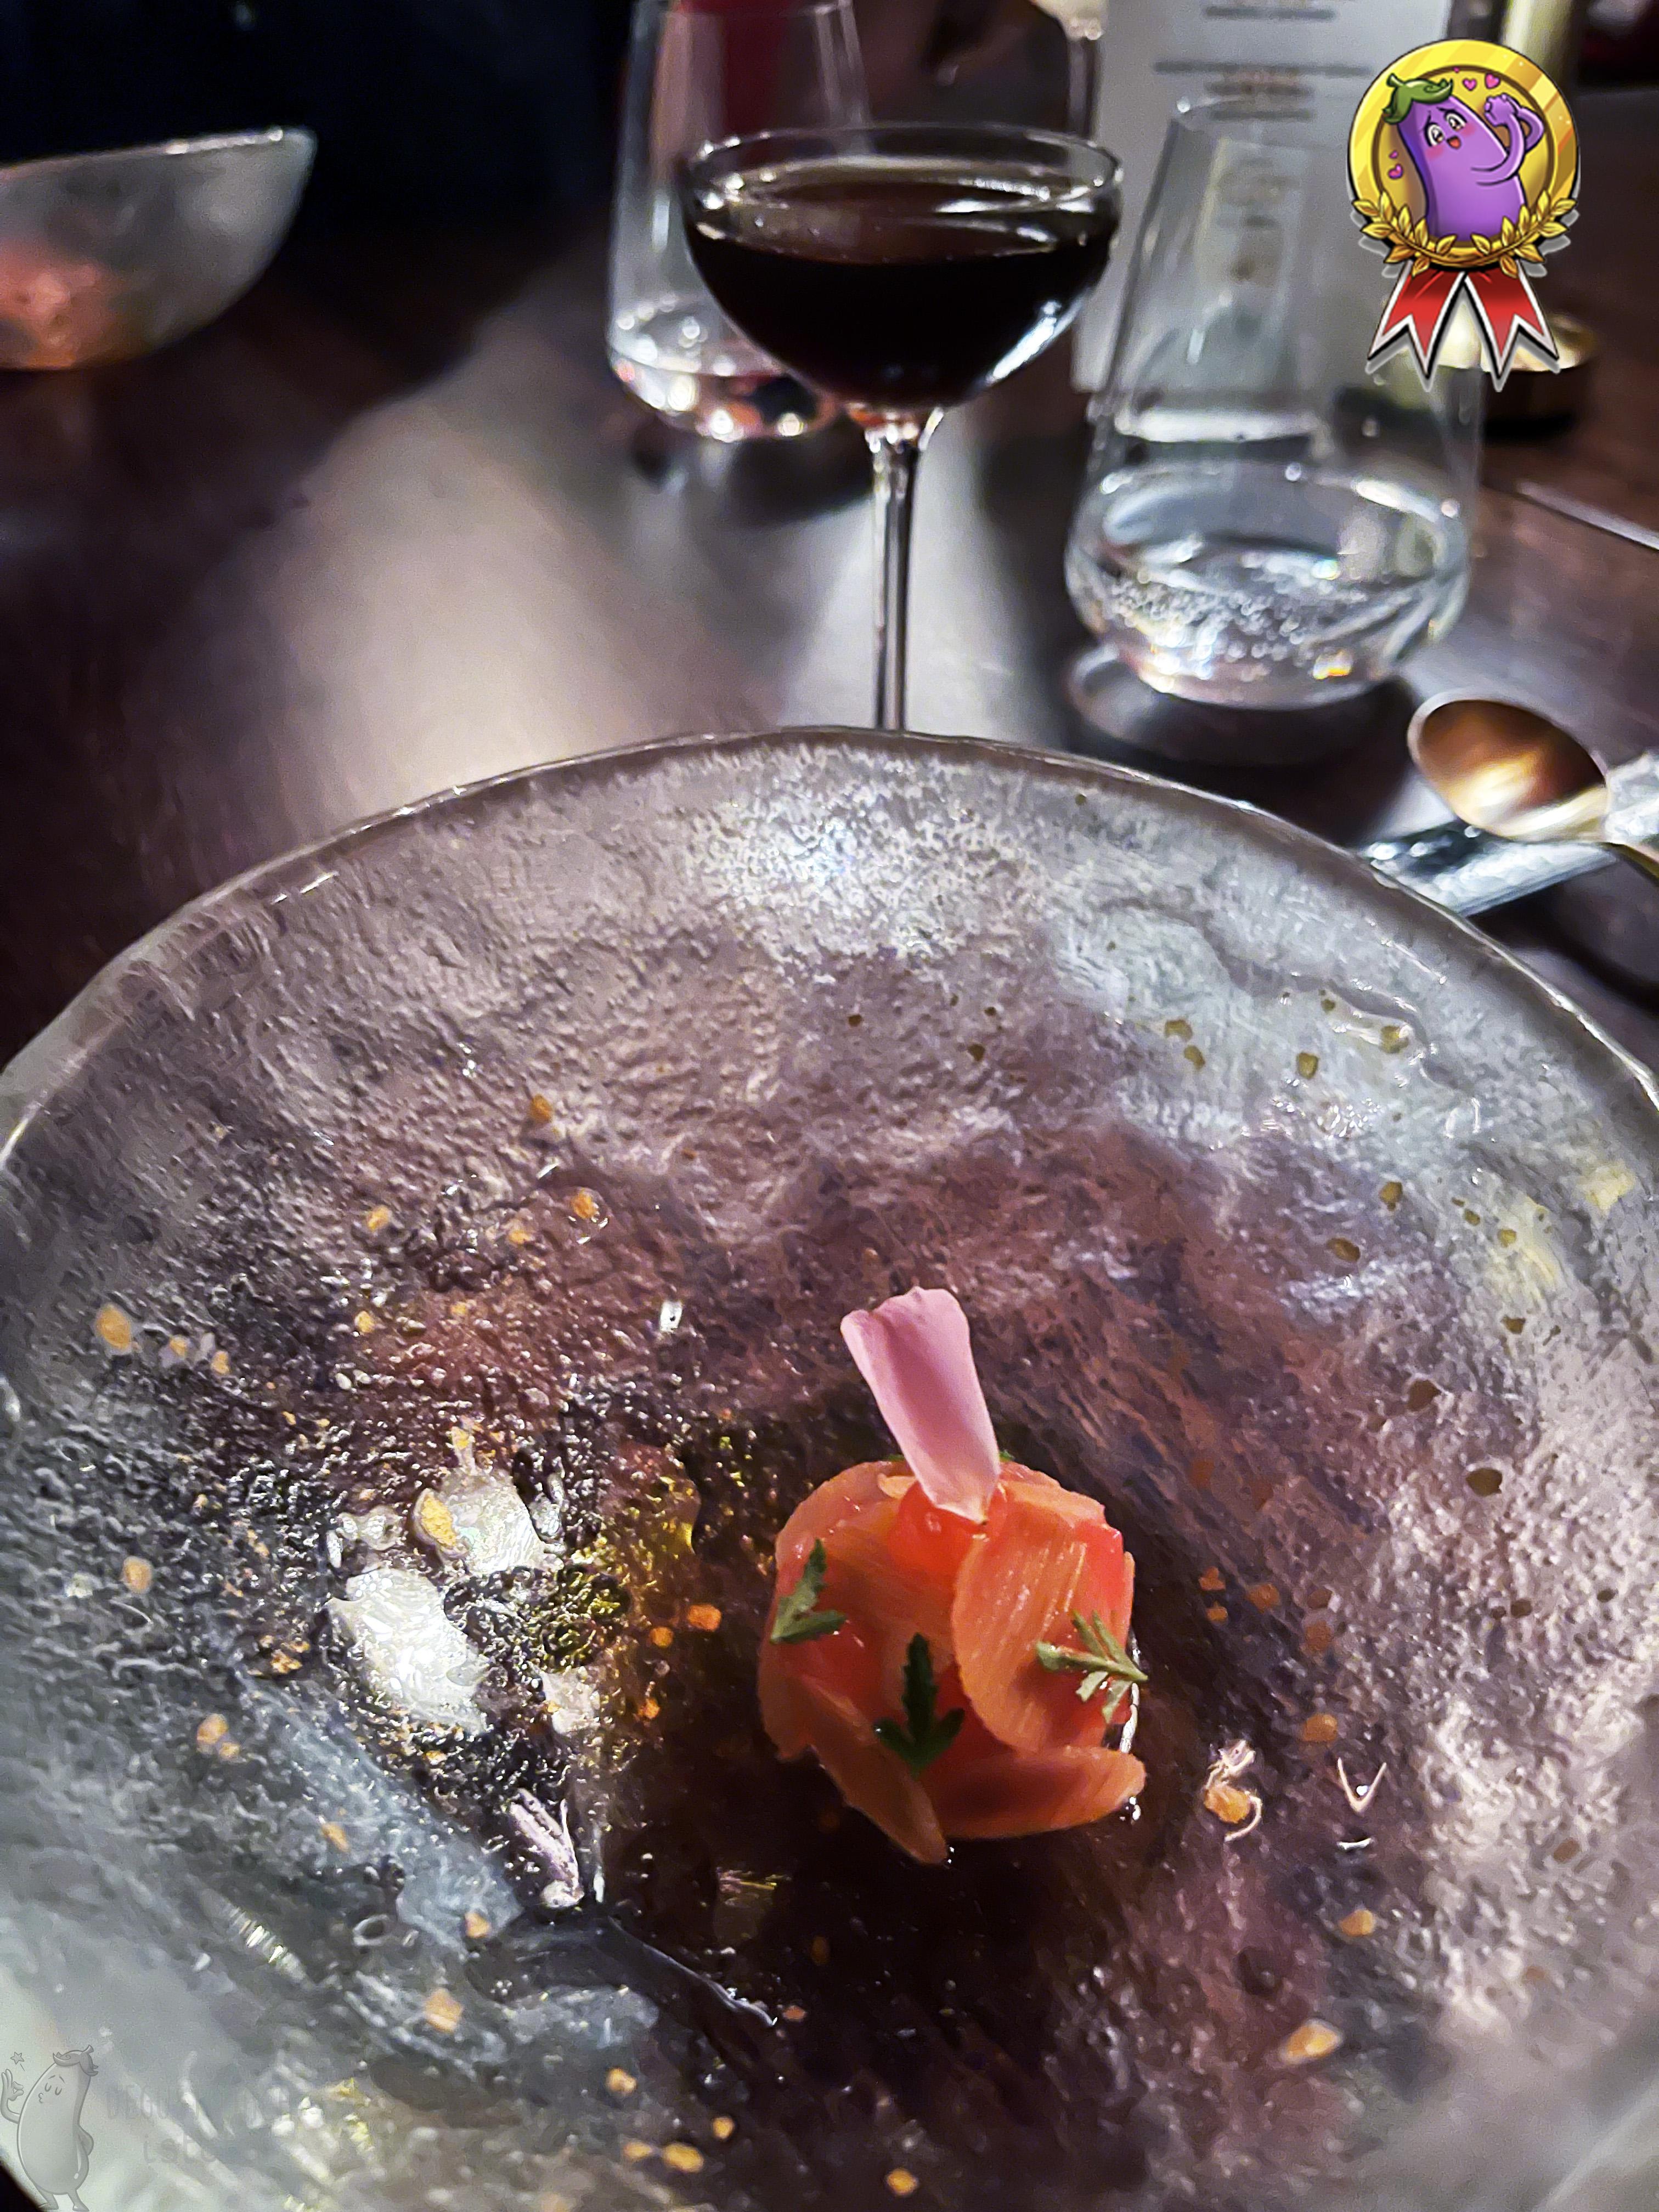 A close-up of a bowl of rhubarb dessert.